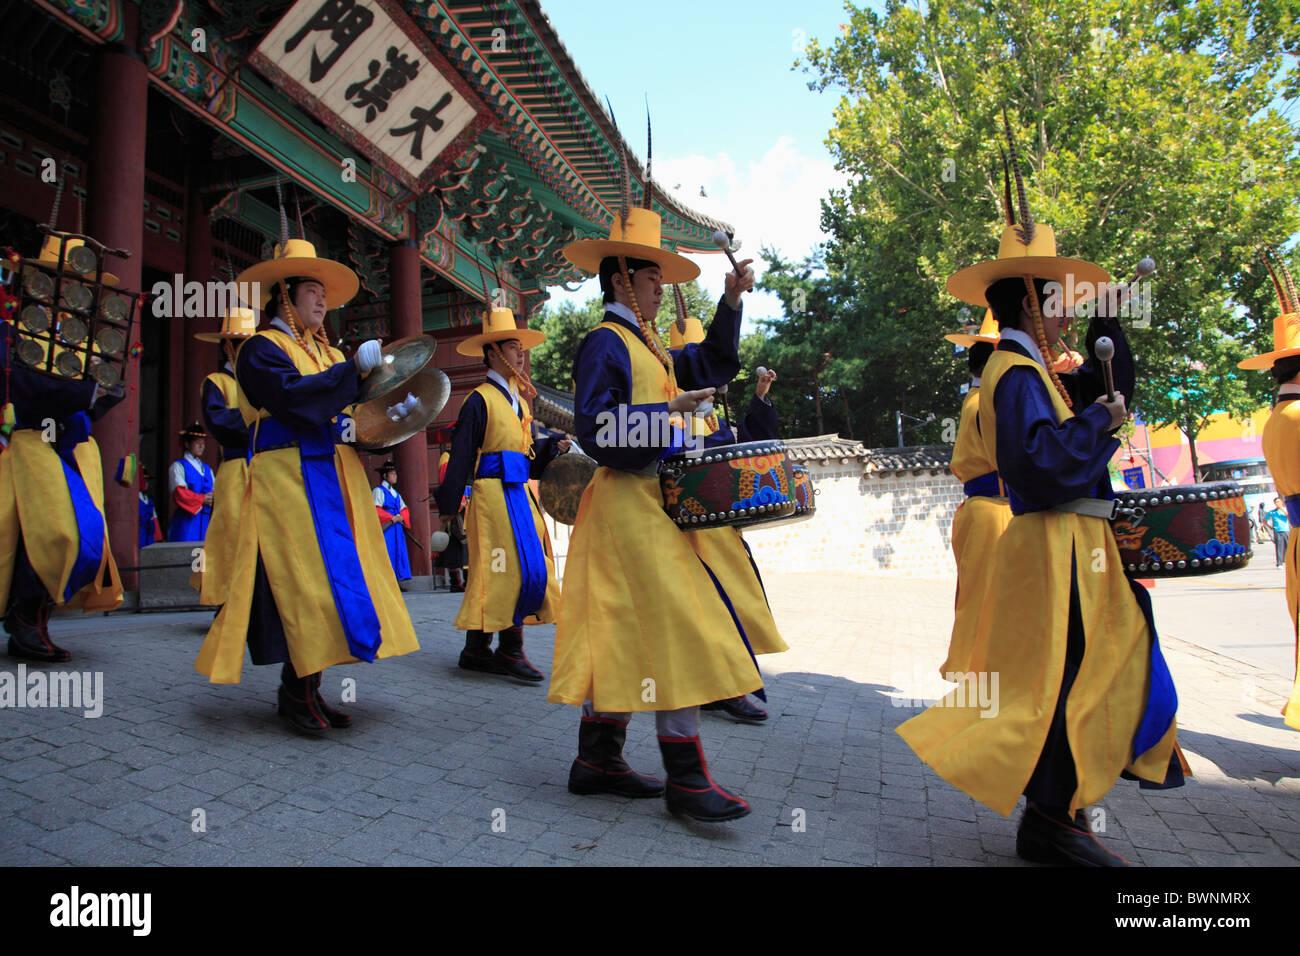 Changing of the Guards, Deoksugung Palace, Palace of Virtuous Longevity, Seoul, South Korea, Asia  Stock Photo